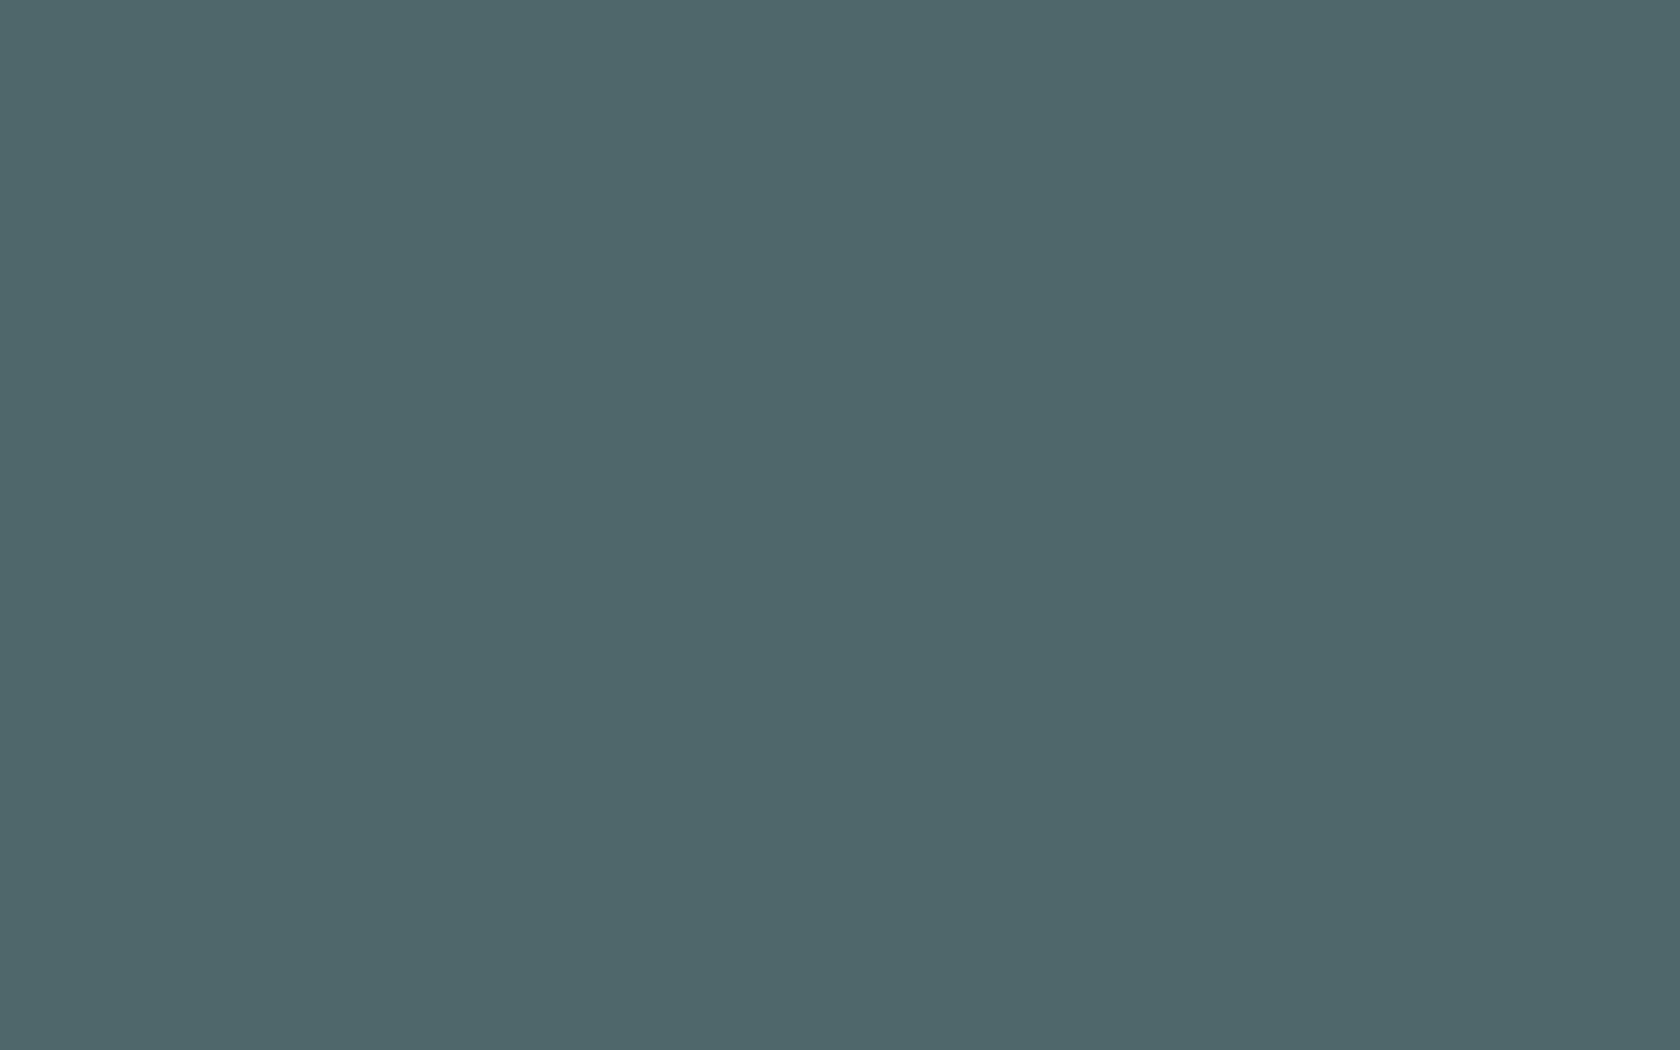 1680x1050 Stormcloud Solid Color Background